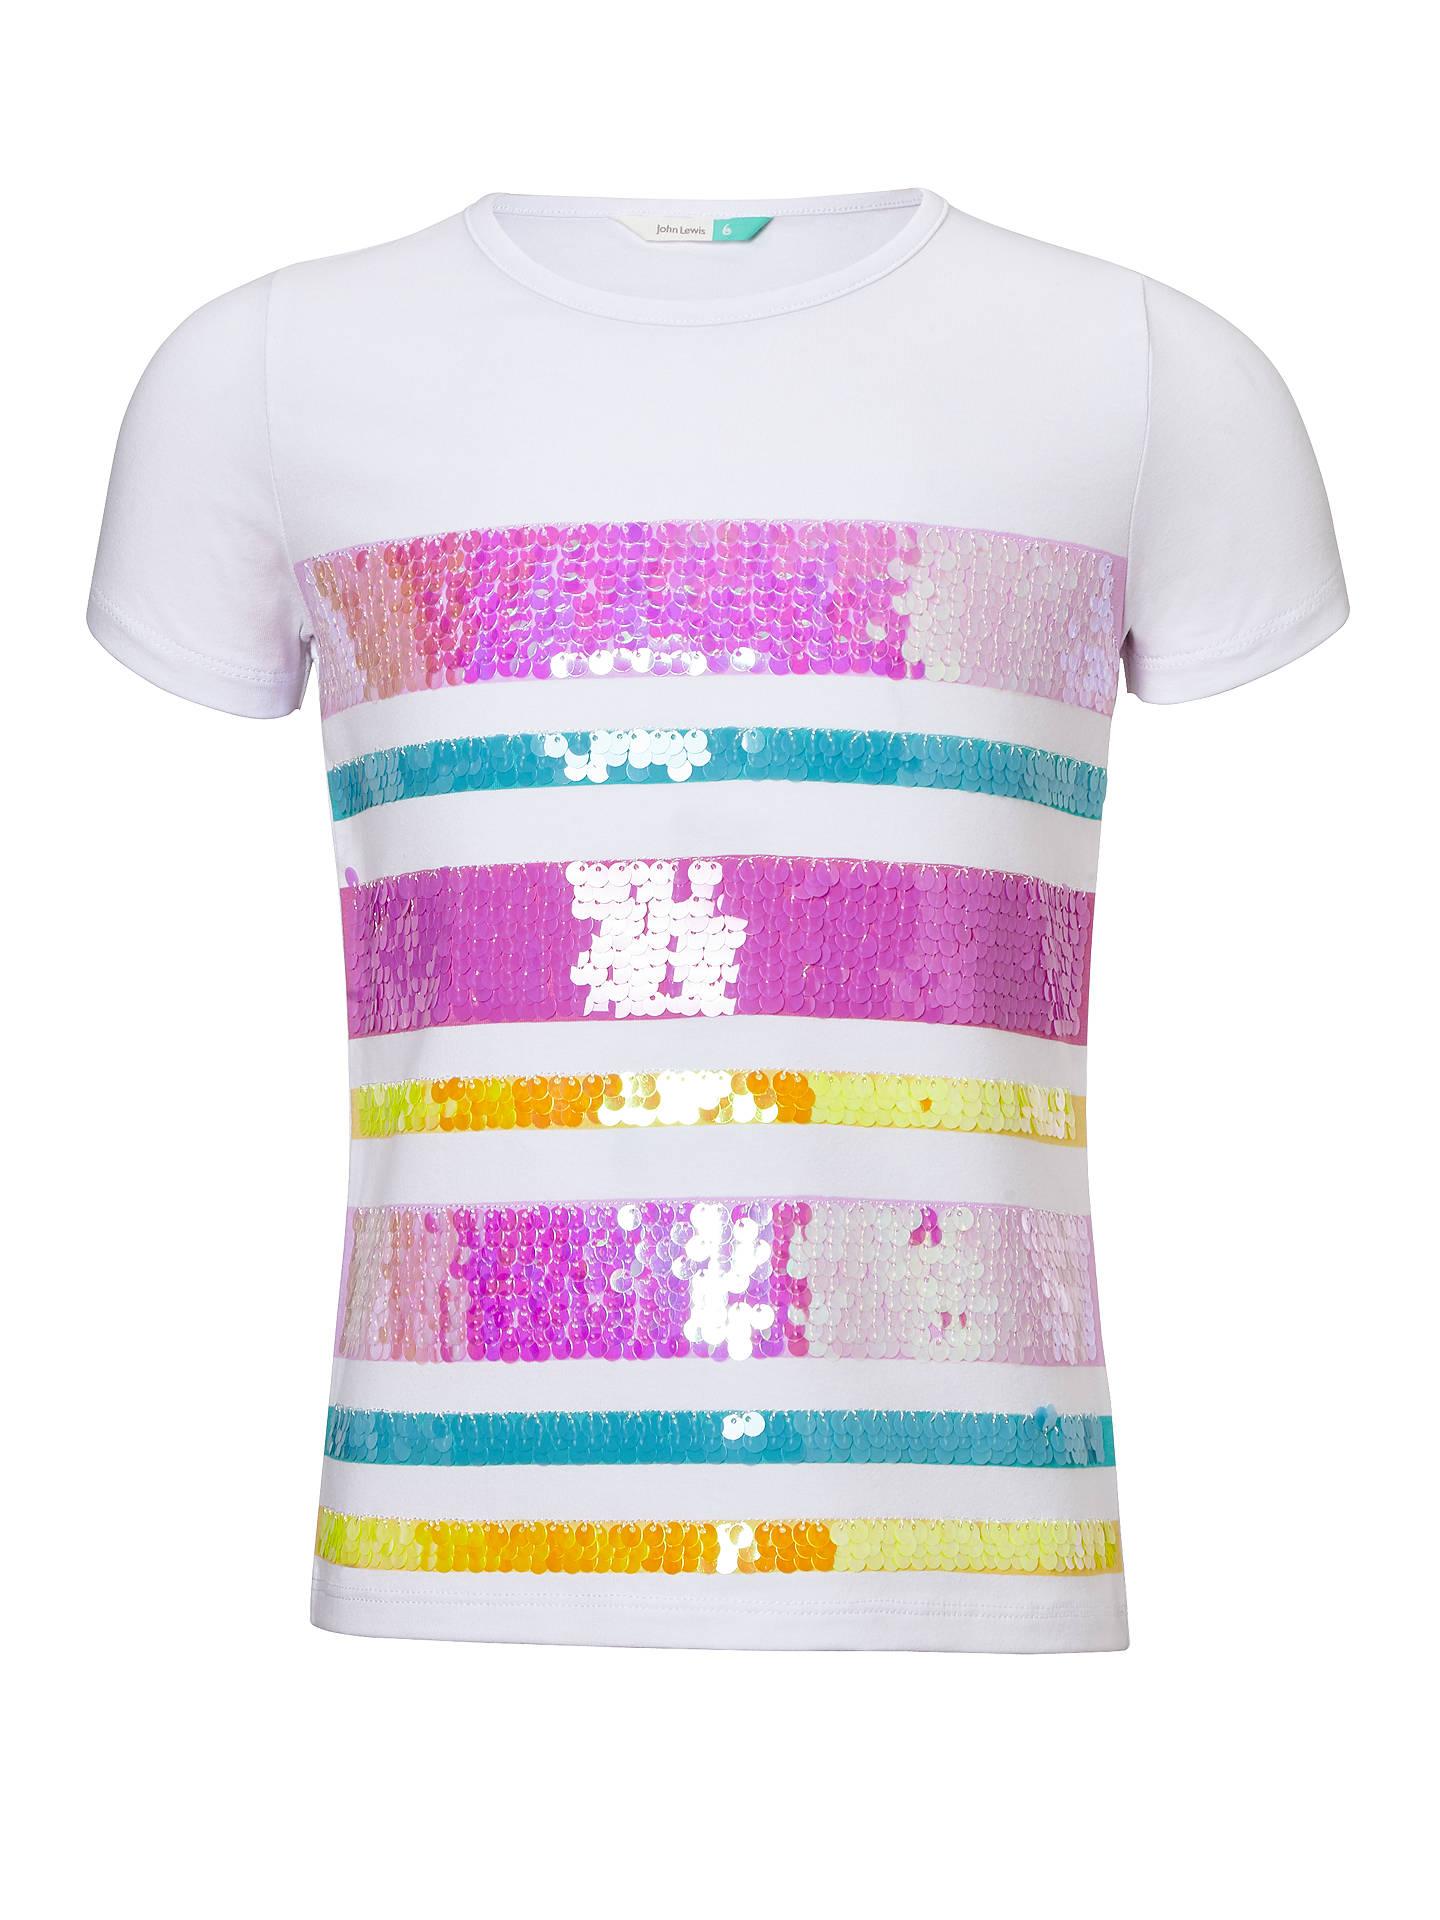 8164c8d043 John Lewis & Partners Girls' Sequin Stripe T-Shirt, White at John ...